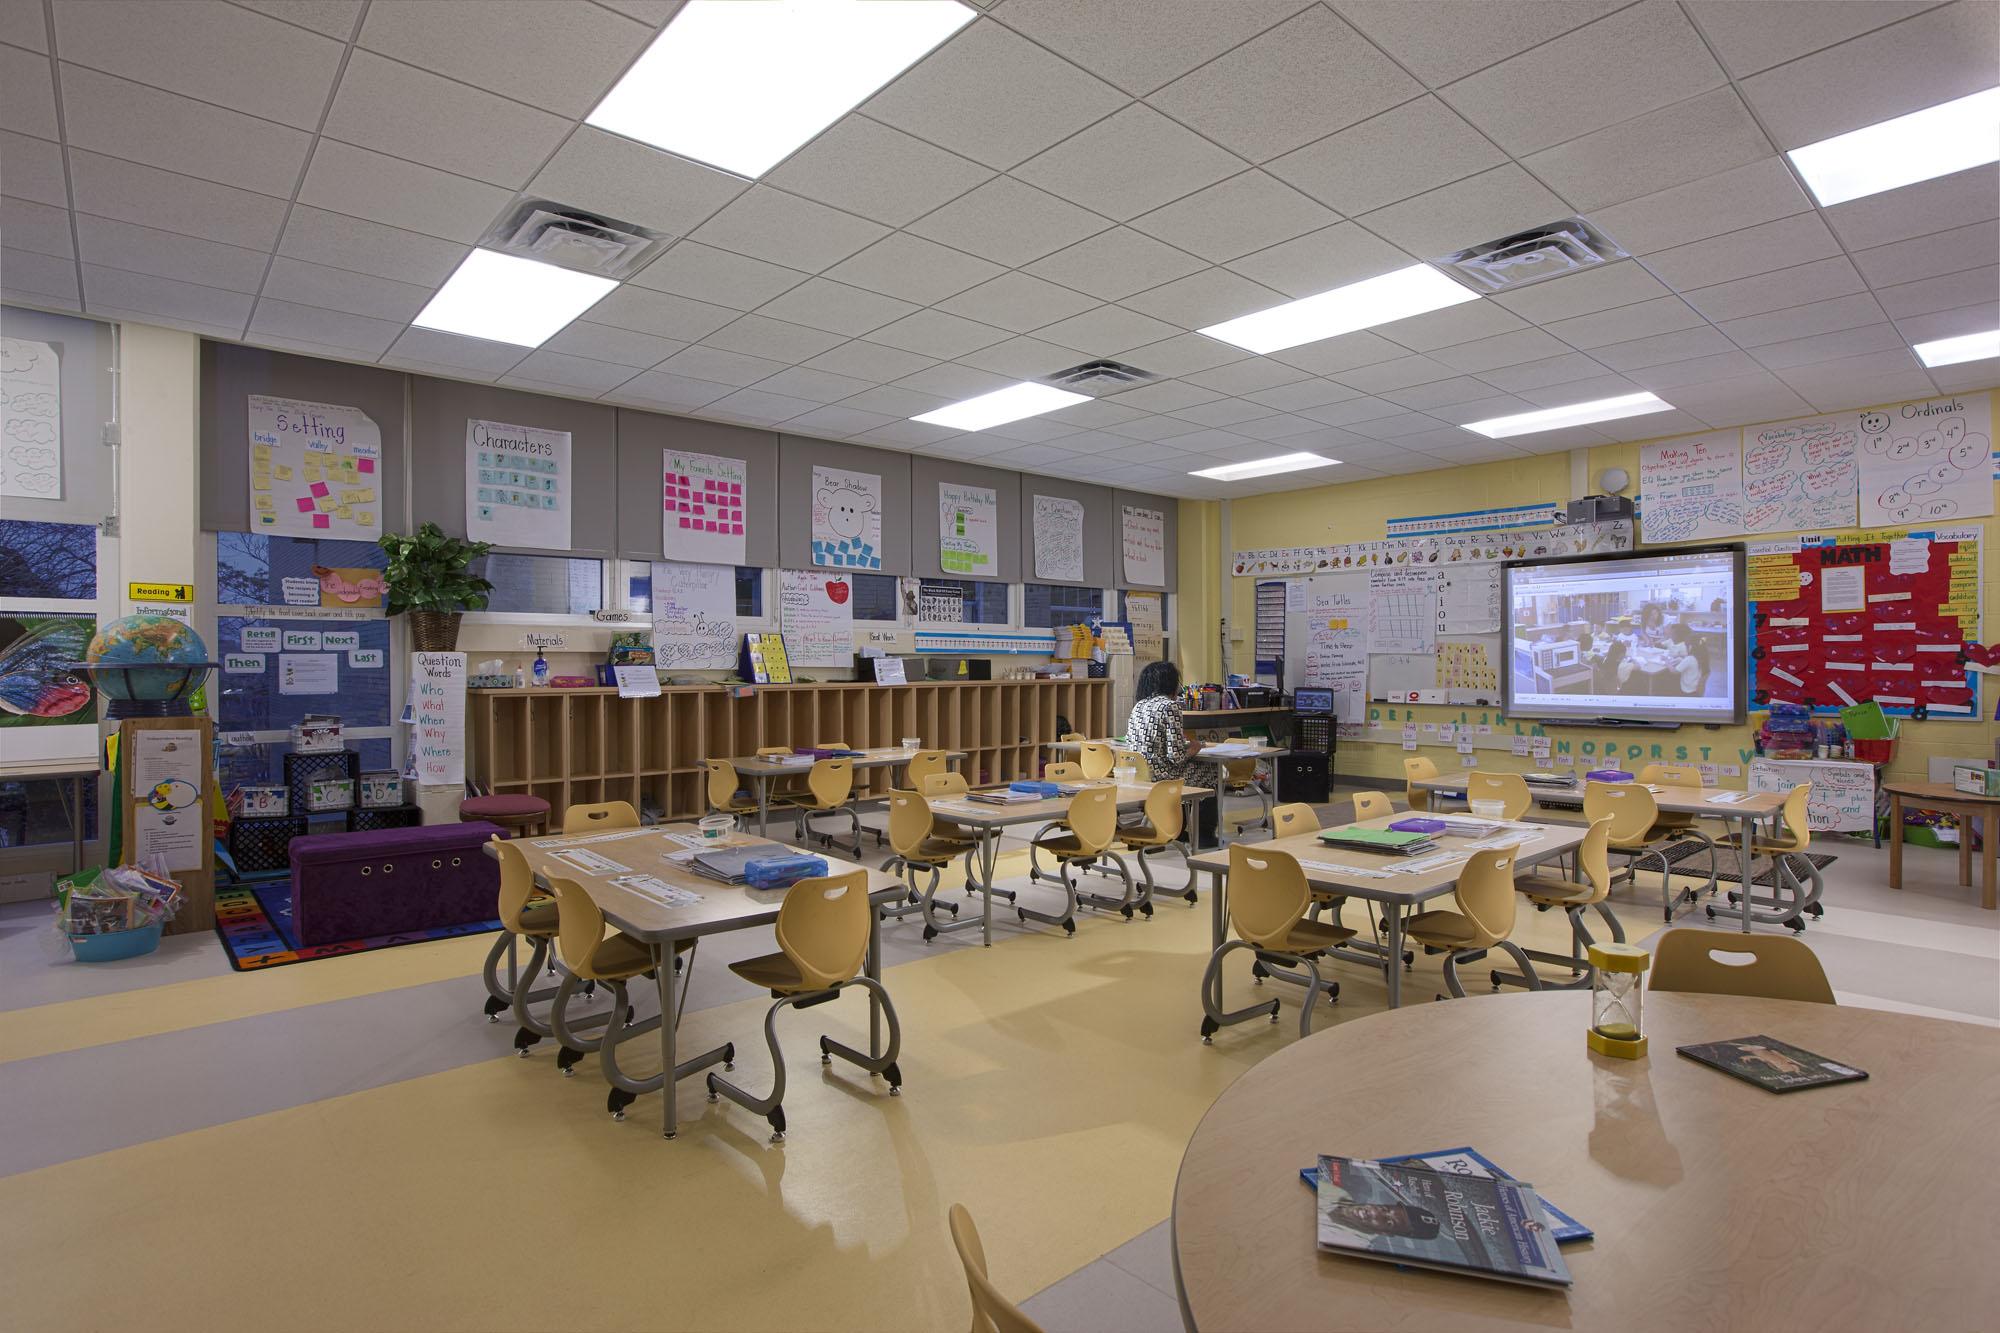 Classroom Image of Ketcham Elementary School-139731.jpg